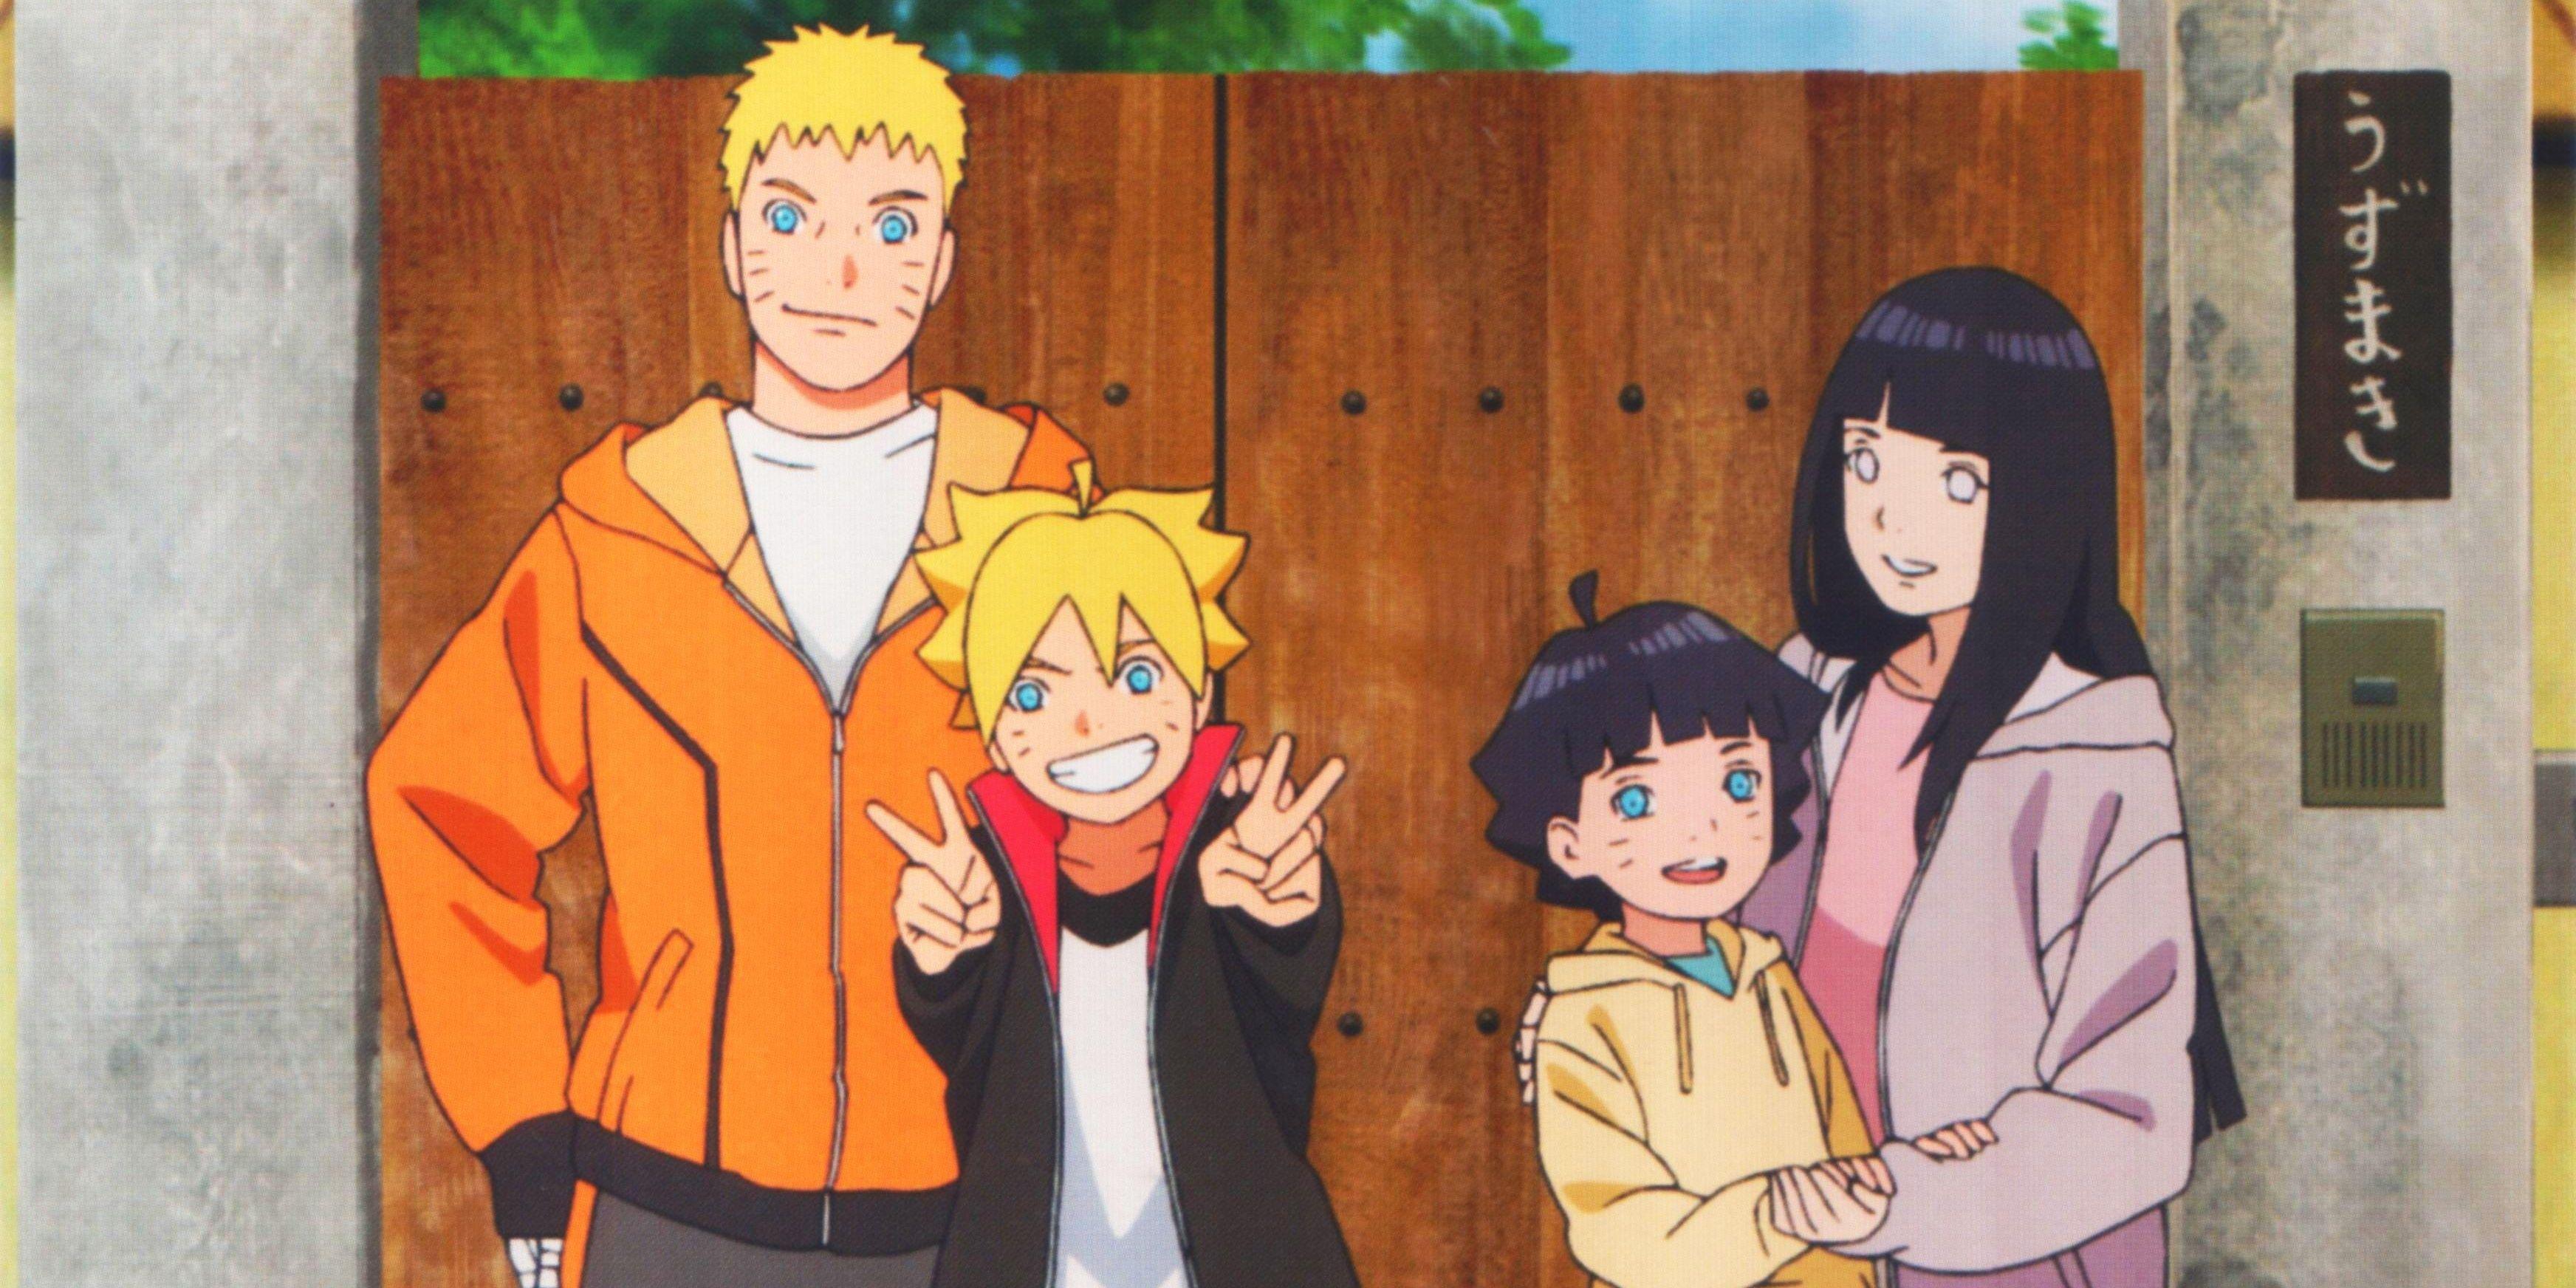 Will naruto marry who Which Naruto